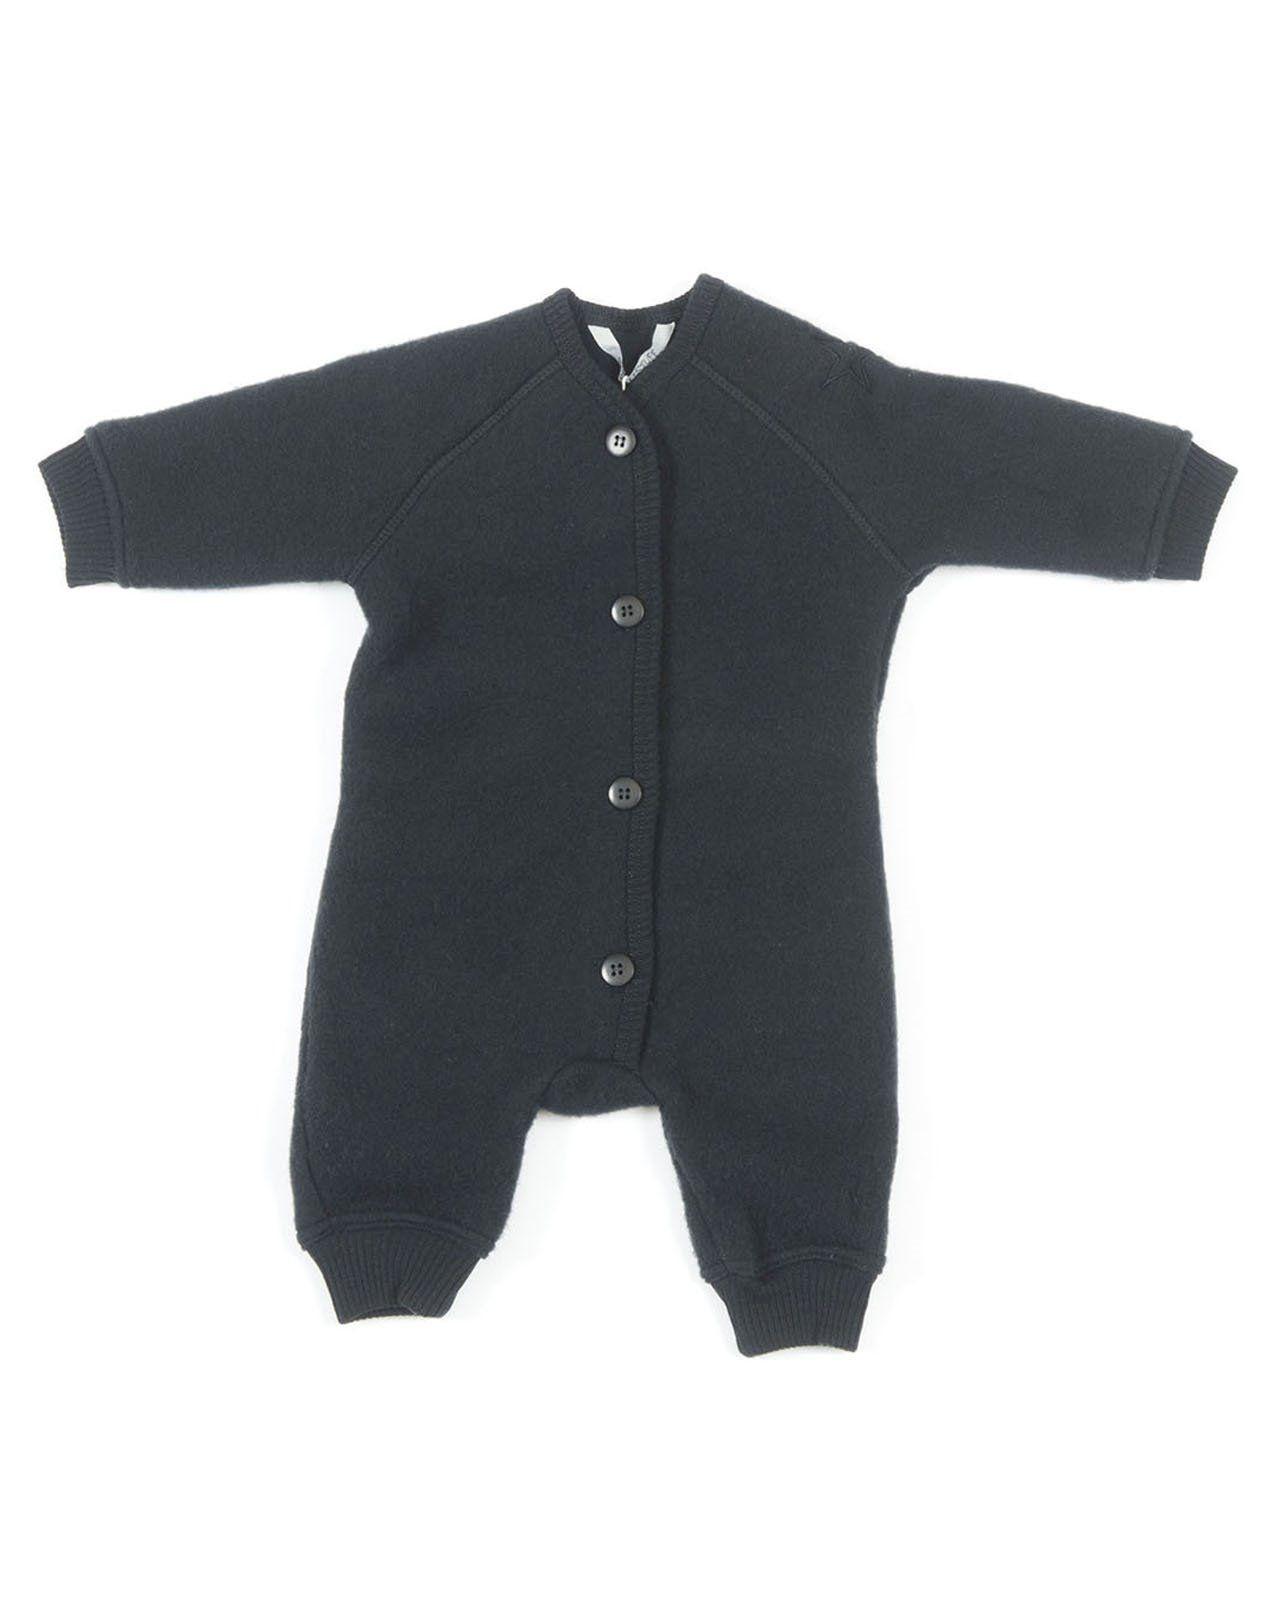 Image of   jumpsuit fra Smallstuff i merino uld med knapper - Black